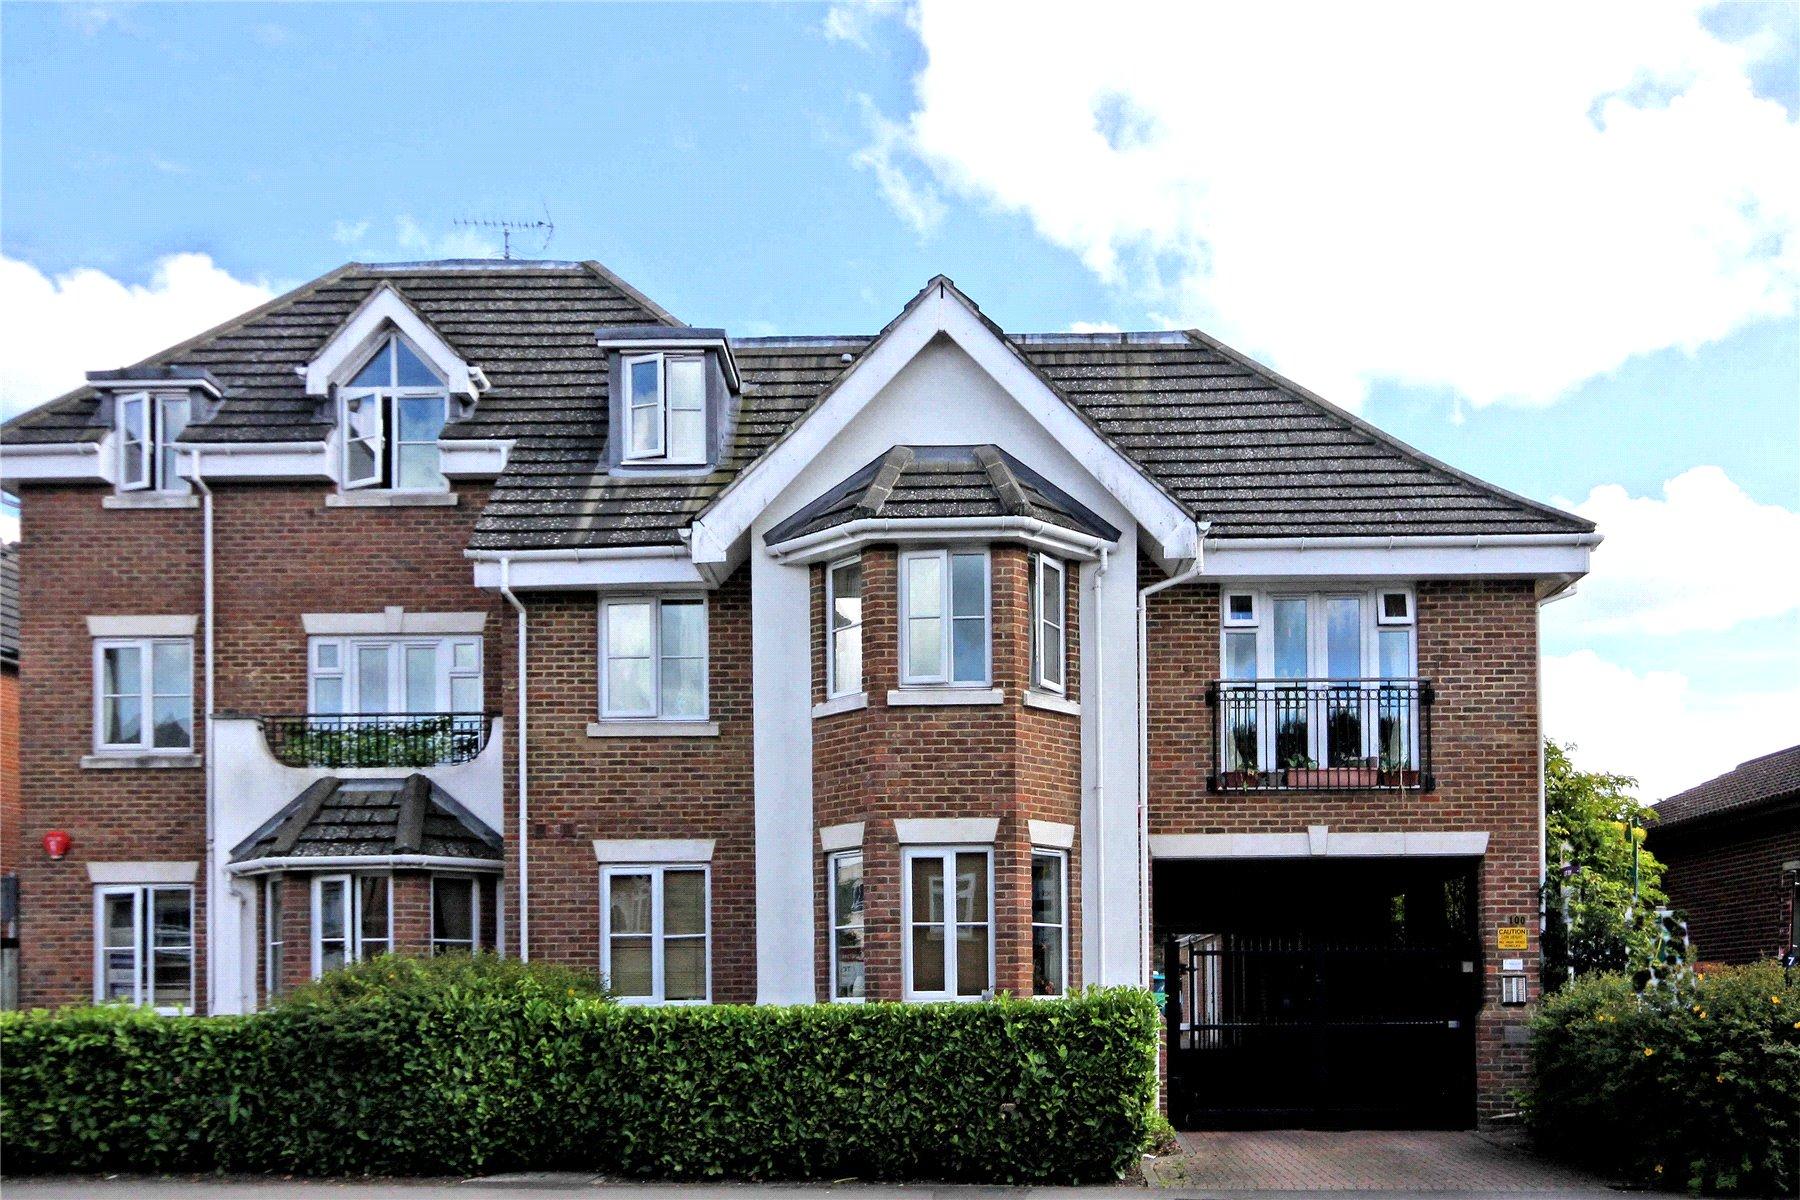 2 Bedrooms Apartment Flat for sale in Vantage Court, 100 Goldsworth Road, Woking, Surrey, GU21